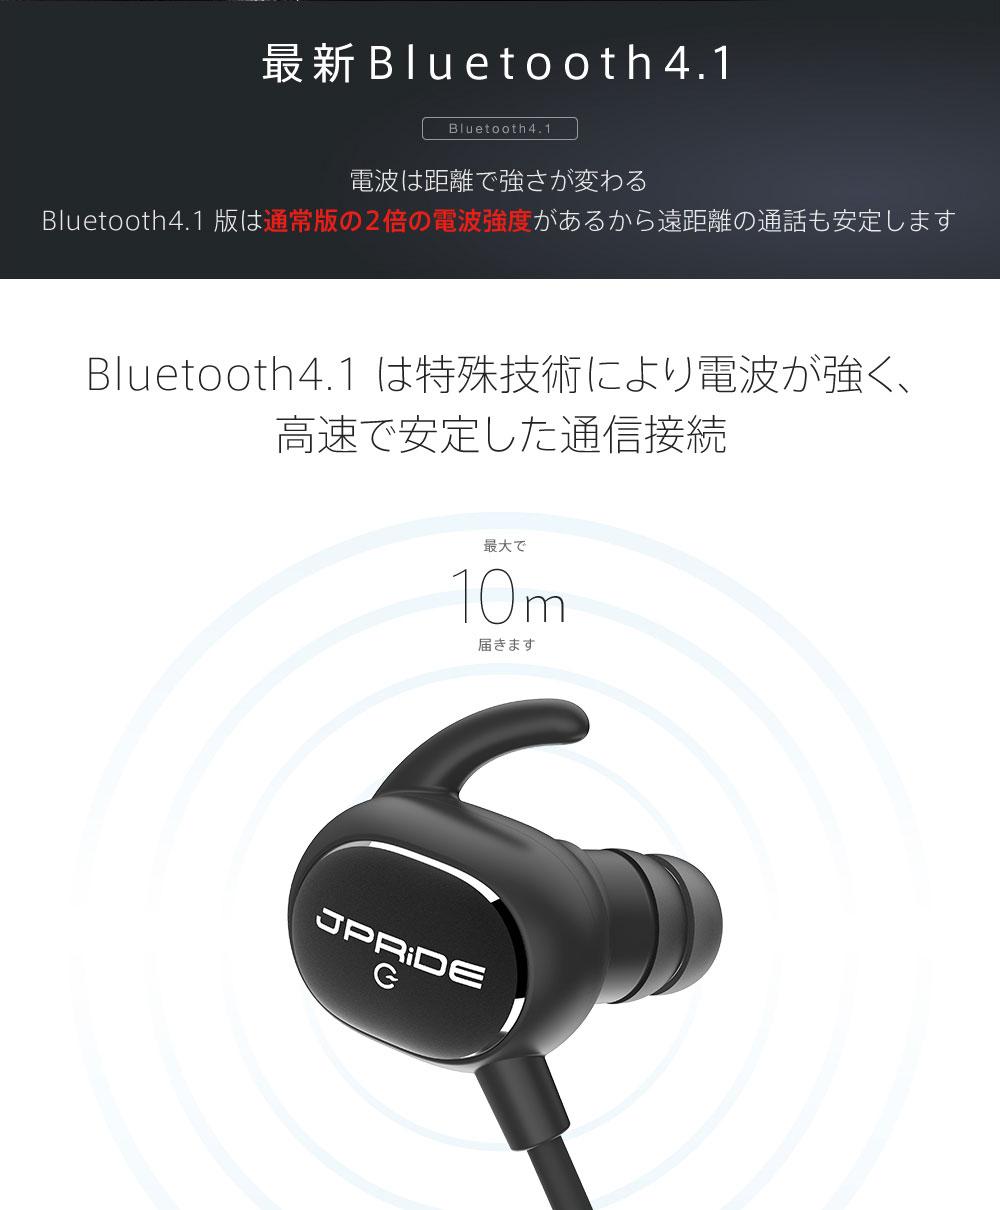 Bluetooth イヤホン 高音質 Bluetooth イヤホン ワイヤレスイヤホン ランニング ブルートゥースイヤホン bluetoothイヤホン 防水/防汗 ワイヤレス イヤホン ブルートゥース イヤホン bluetooth イヤフォン